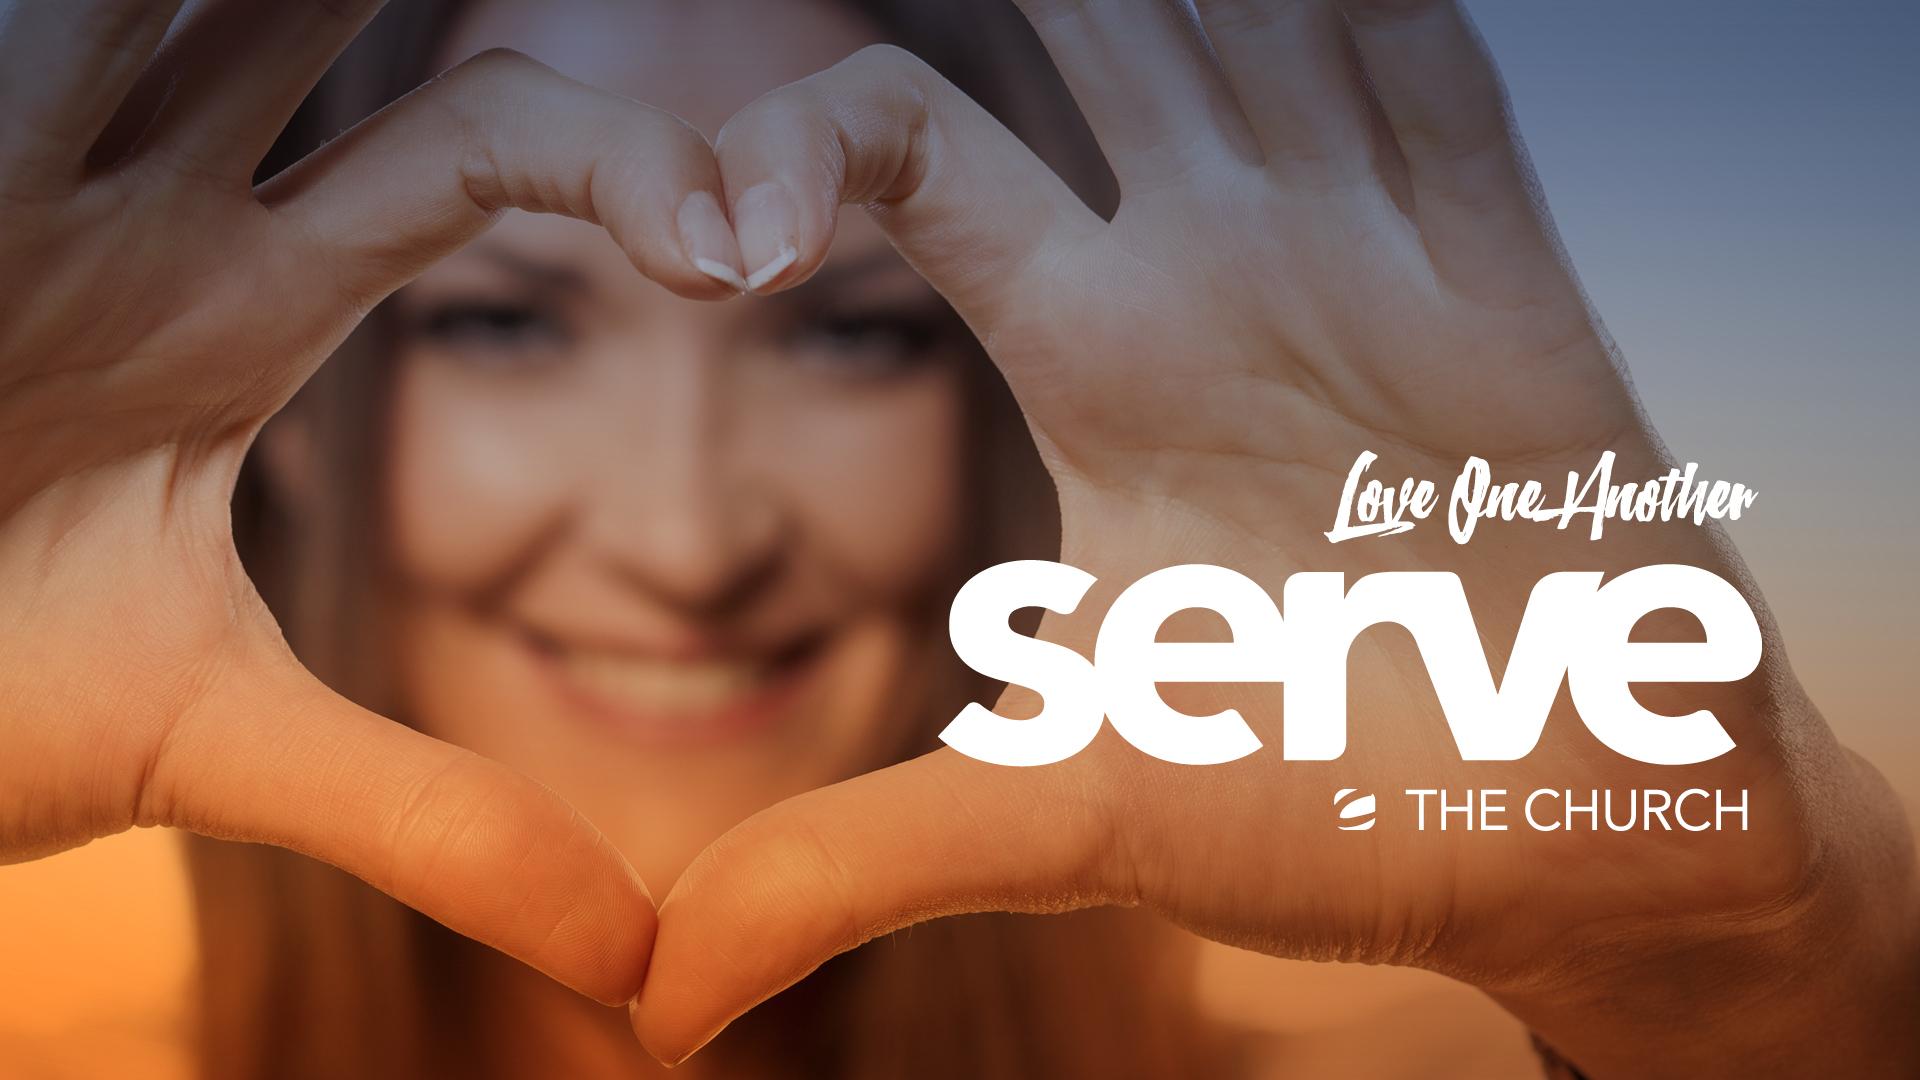 Serve the church web